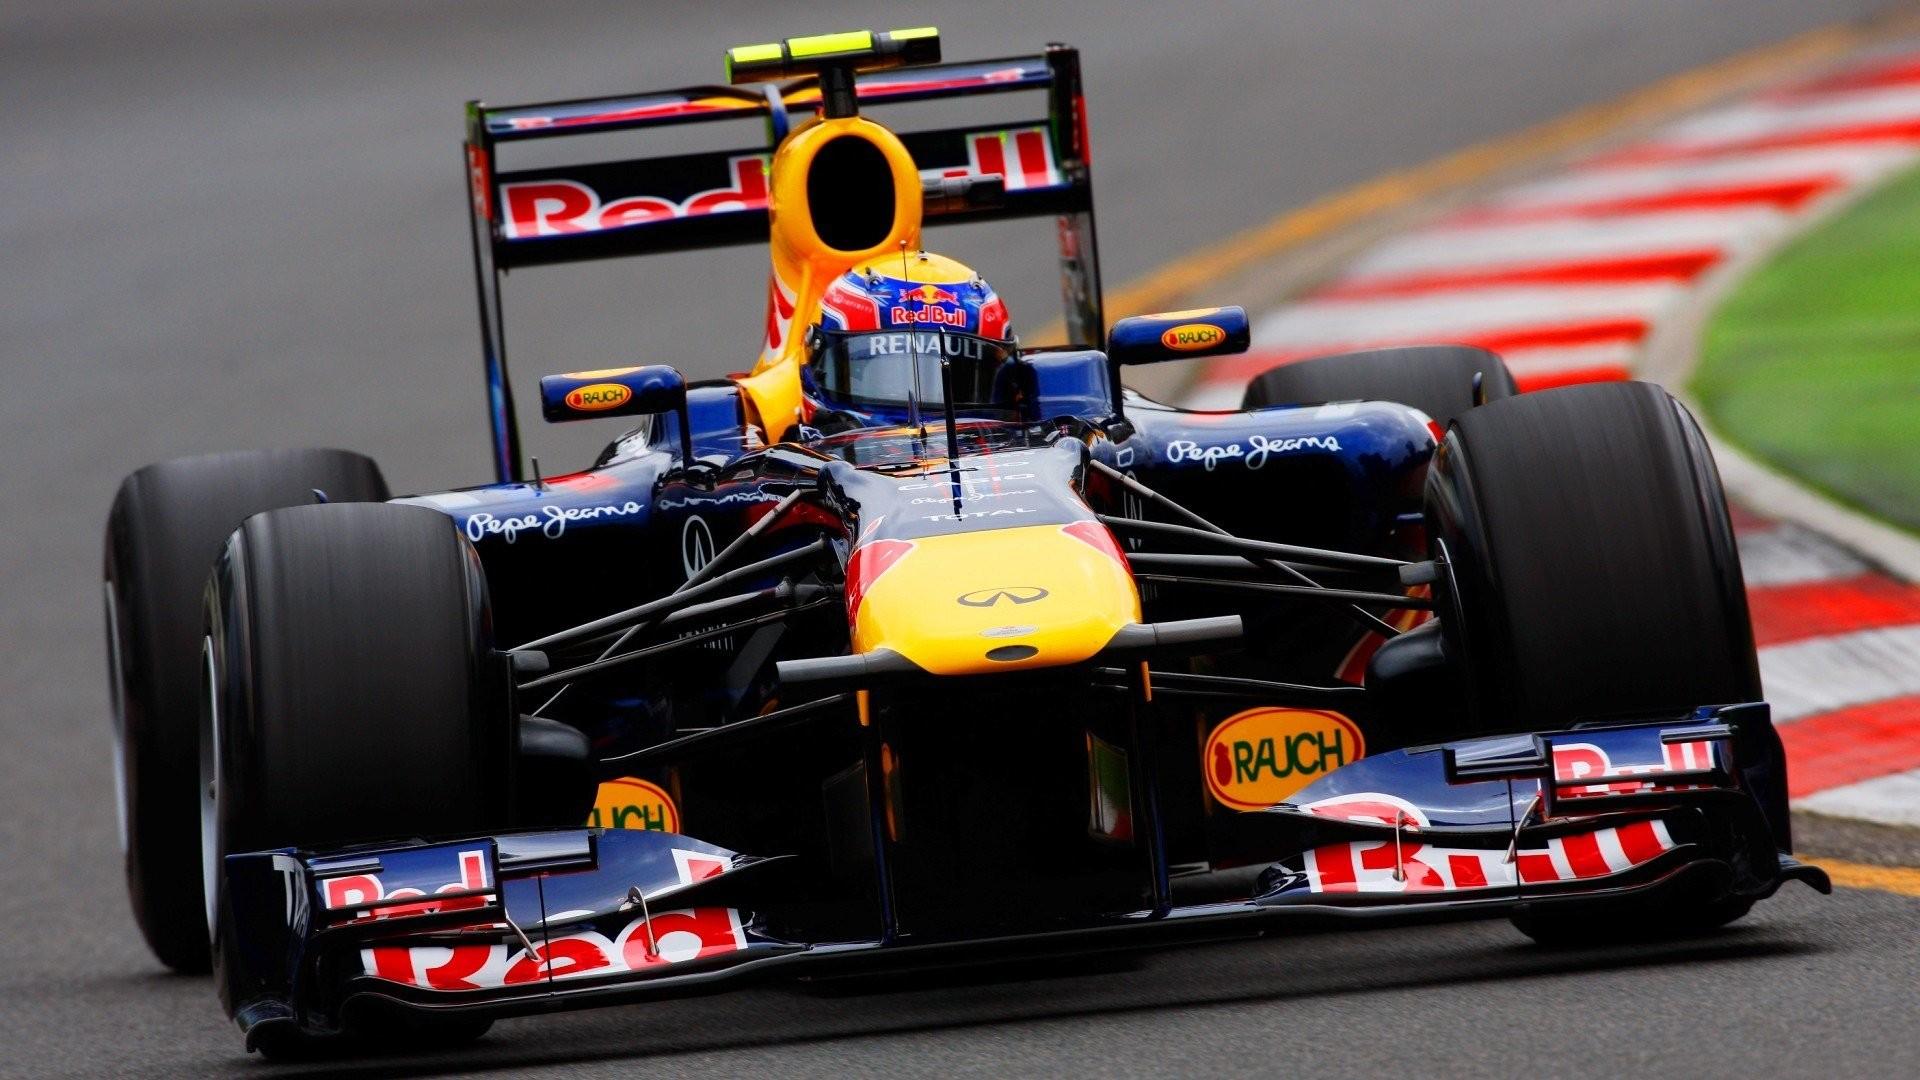 Mercedes Gp Formula 1 4k Hd Desktop Wallpaper For 4k Ultra: Red Bull F1 Wallpaper ·① WallpaperTag